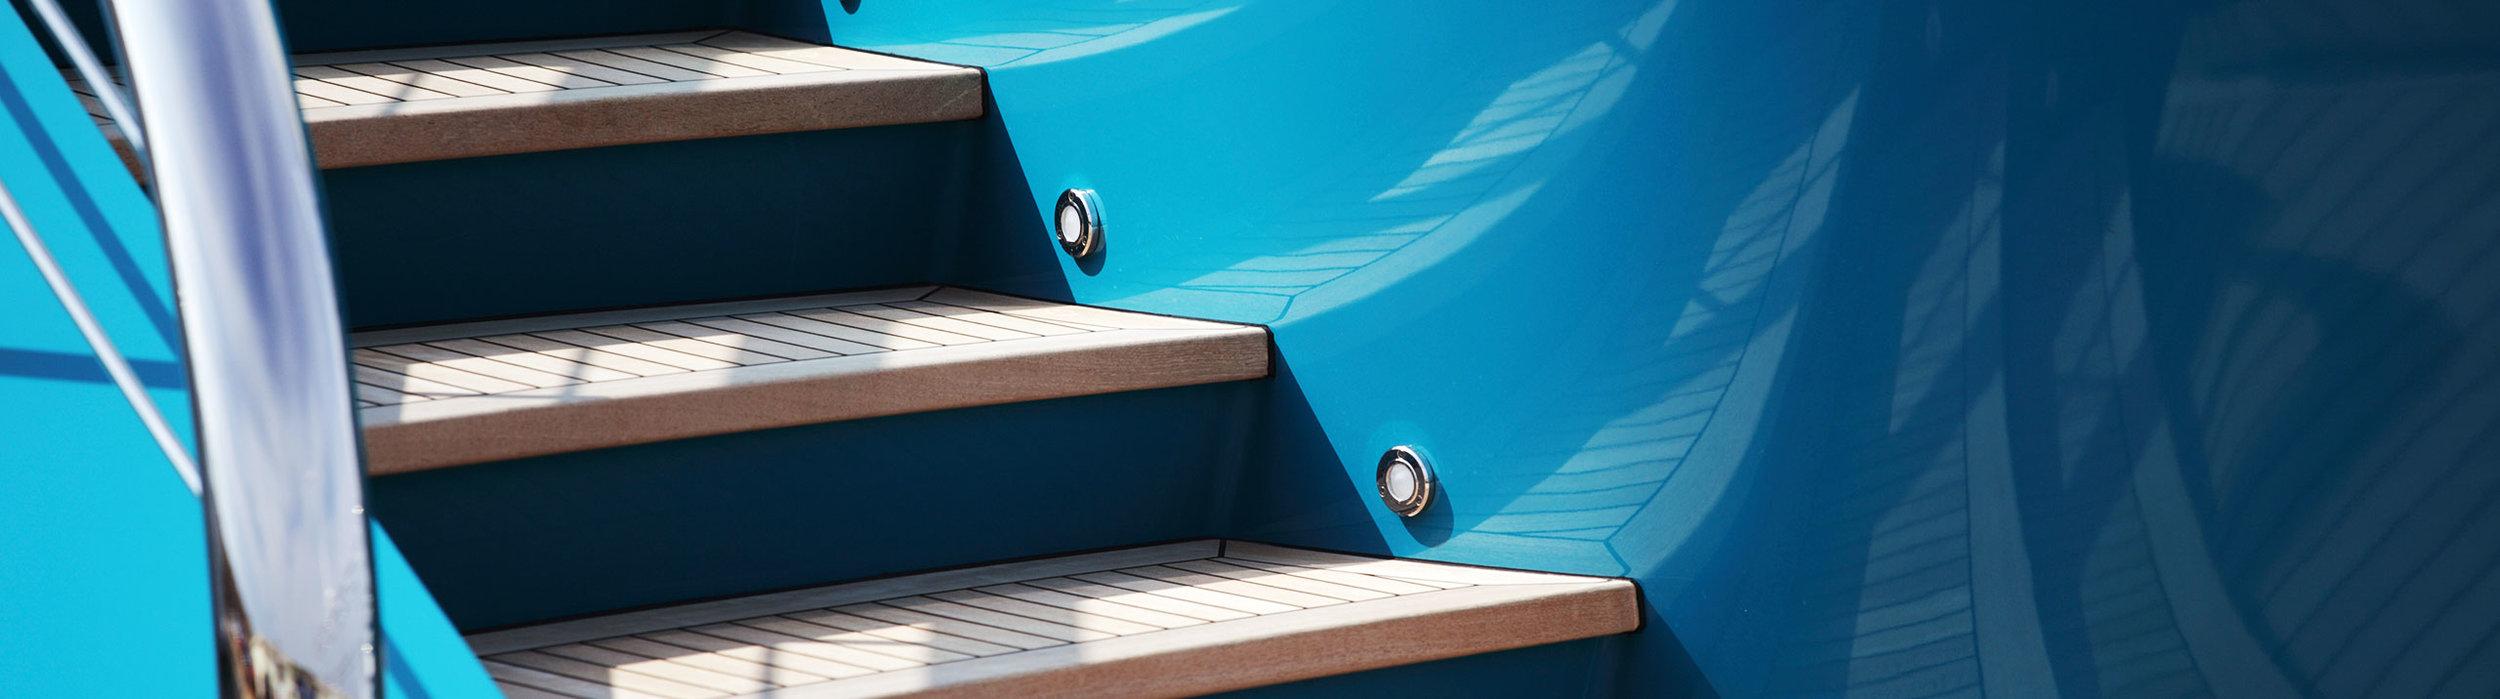 Superyacht02.jpg